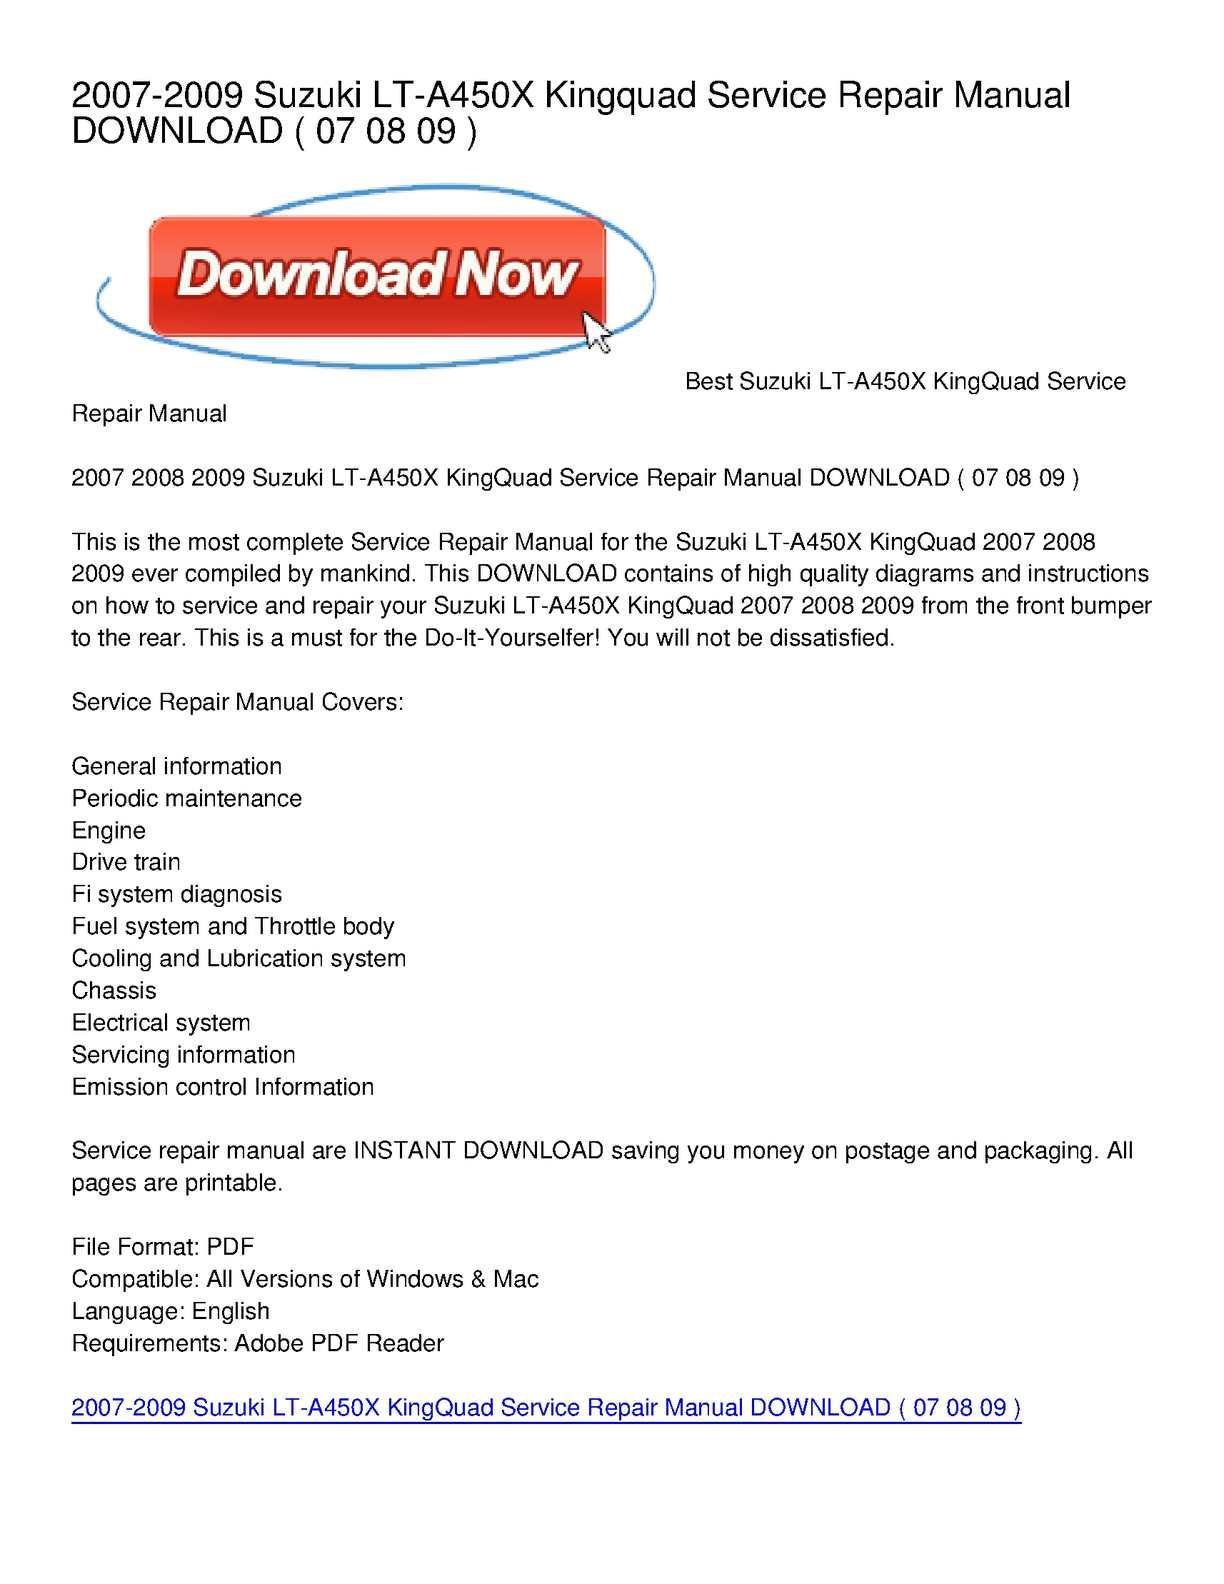 Calaméo - 2007-2009 Suzuki LT-A450X Kingquad Service Repair Manual DOWNLOAD